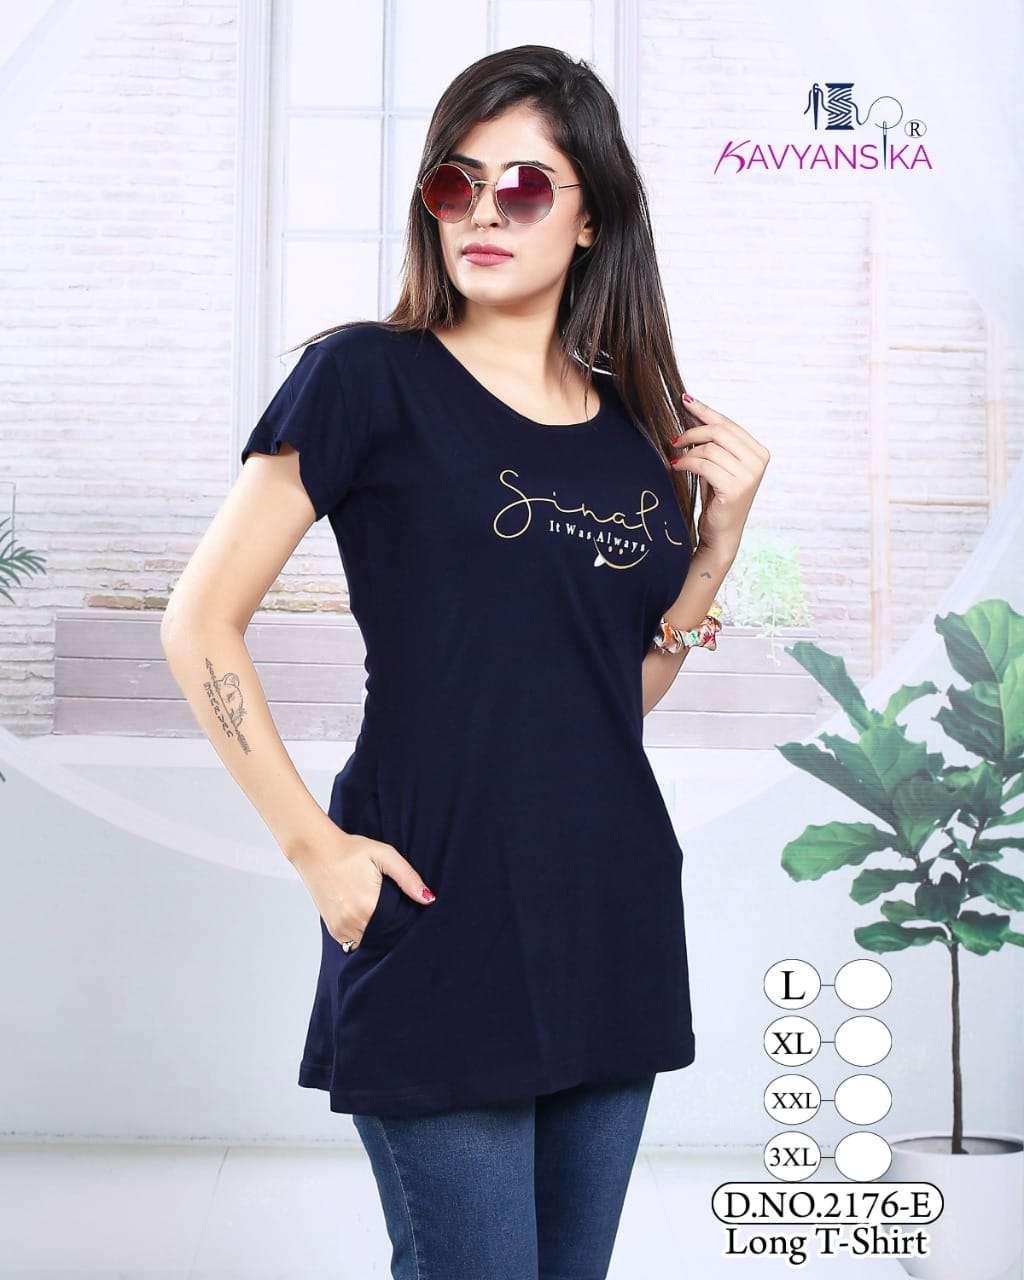 Kavyansika 2176 Hosiery Cotton Ladies T-shirt With Pocket